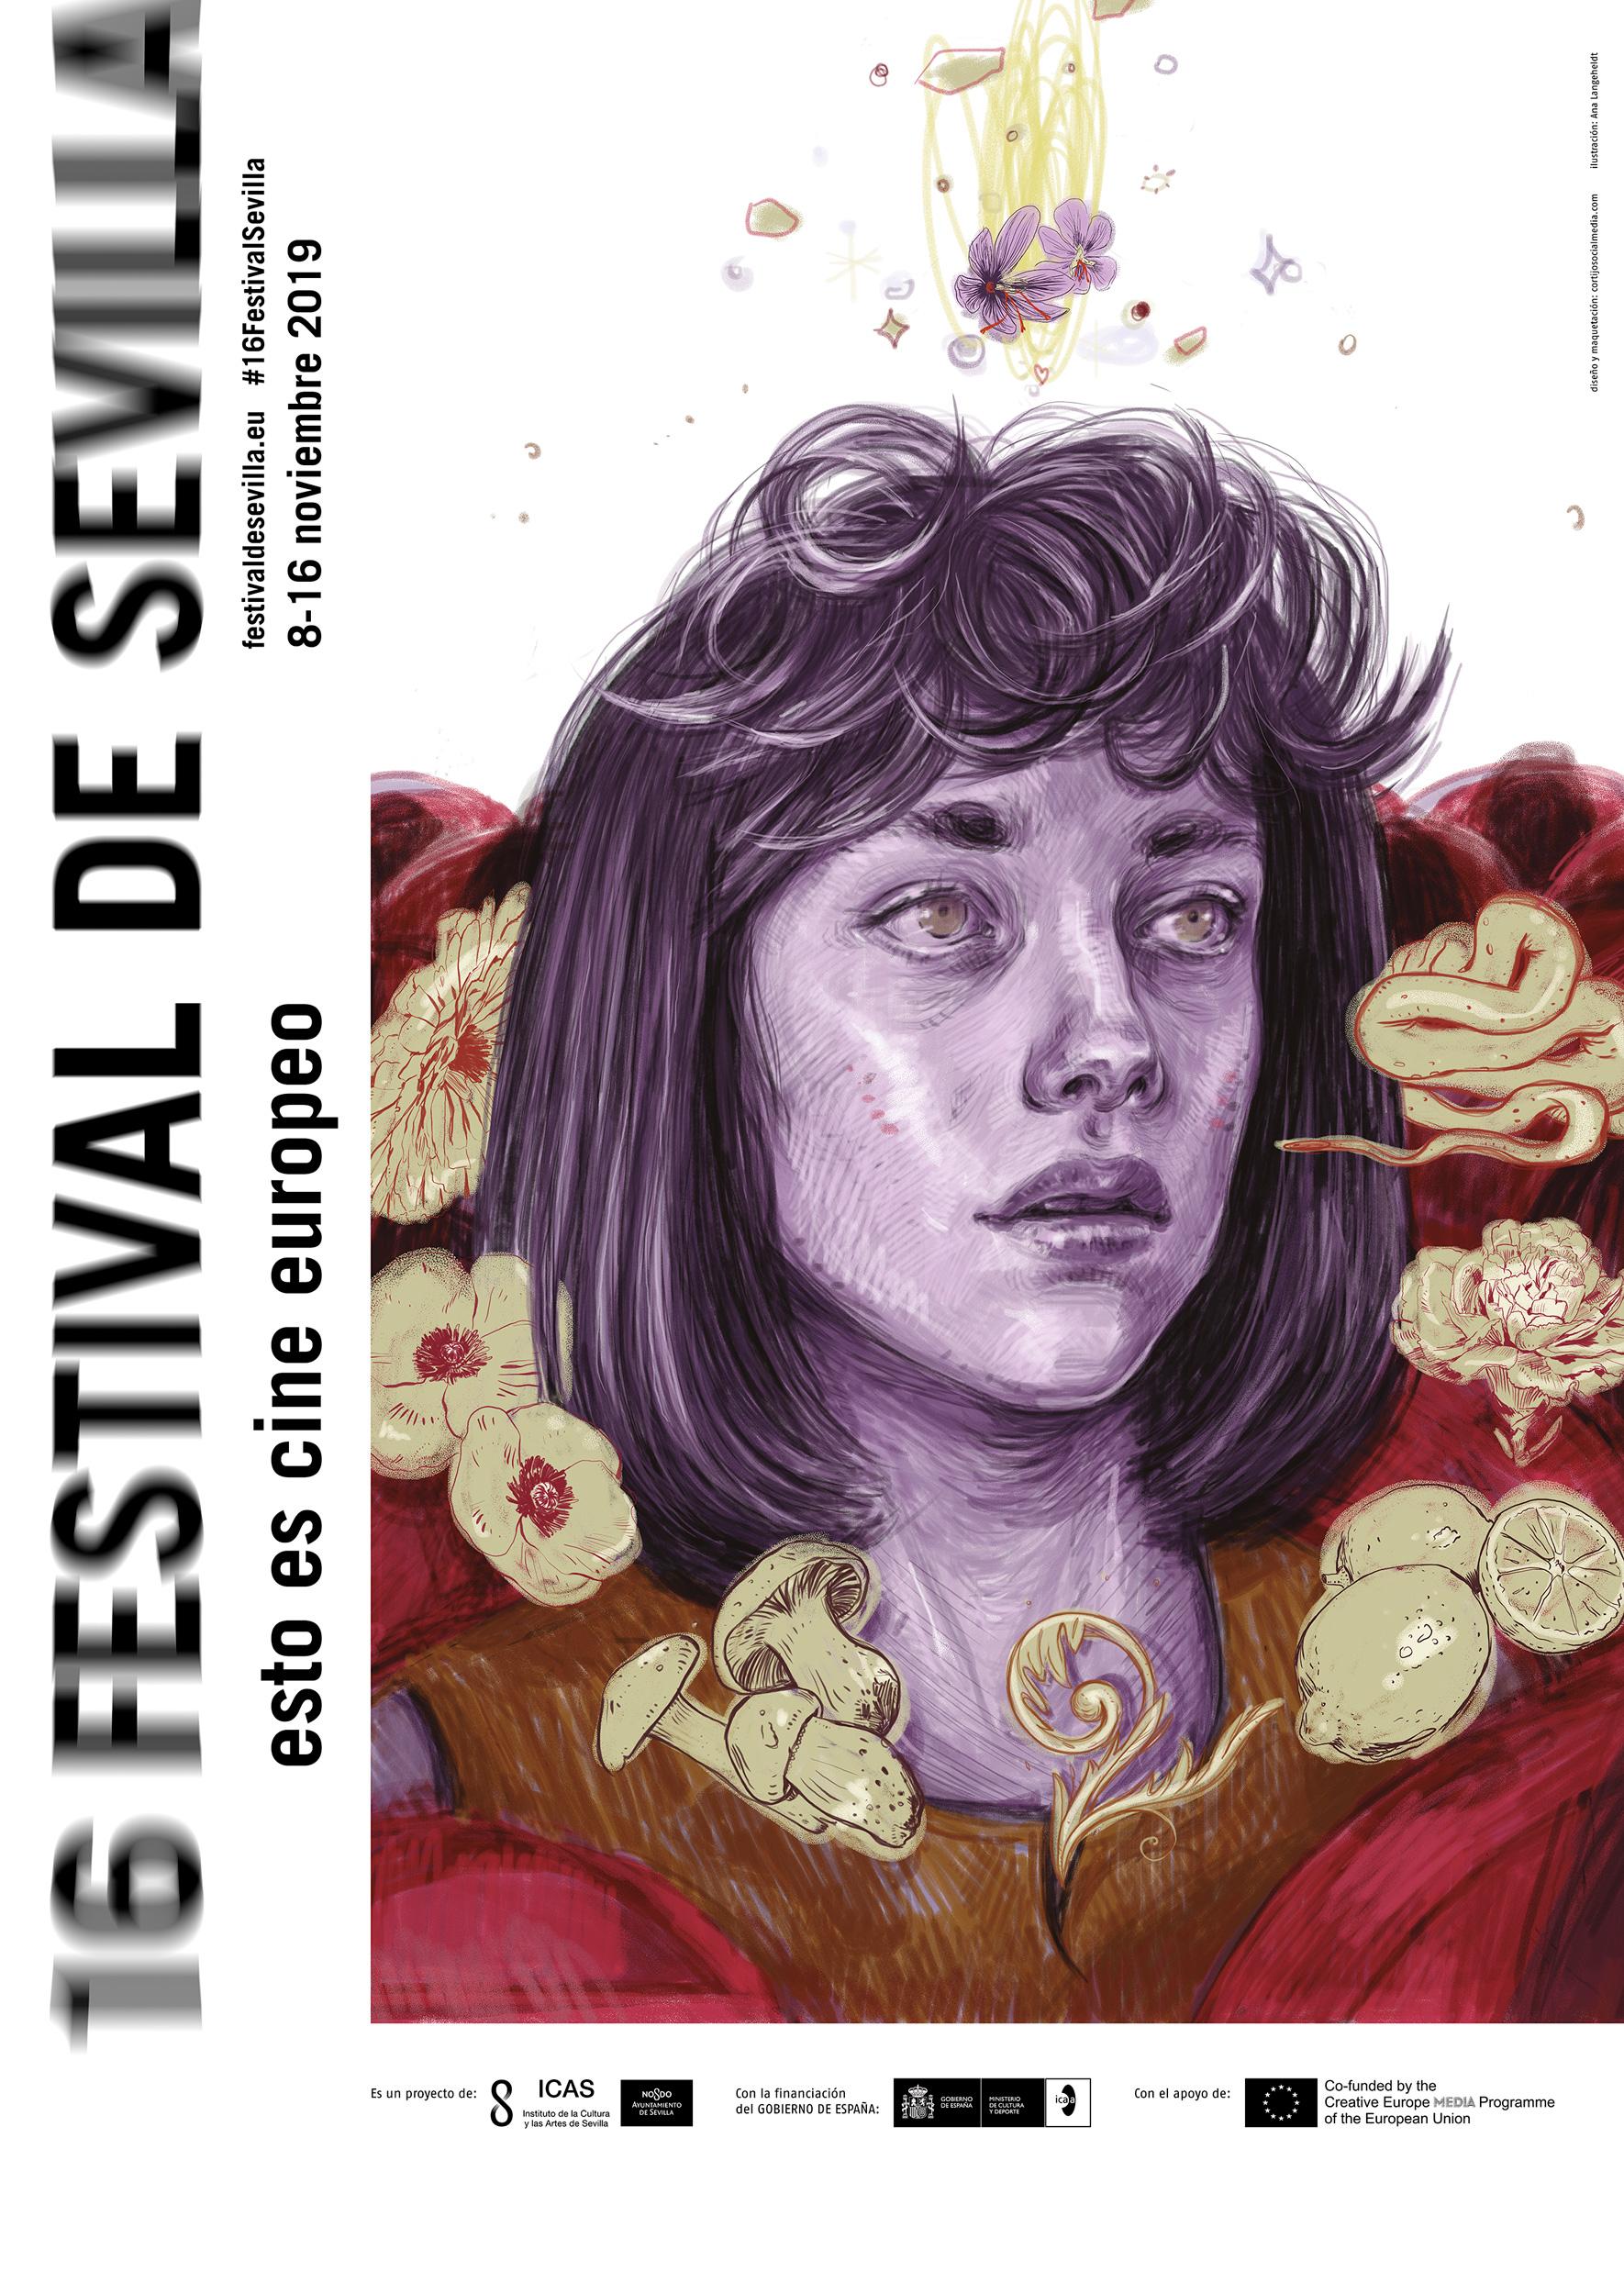 festival de sevilla (cartel)